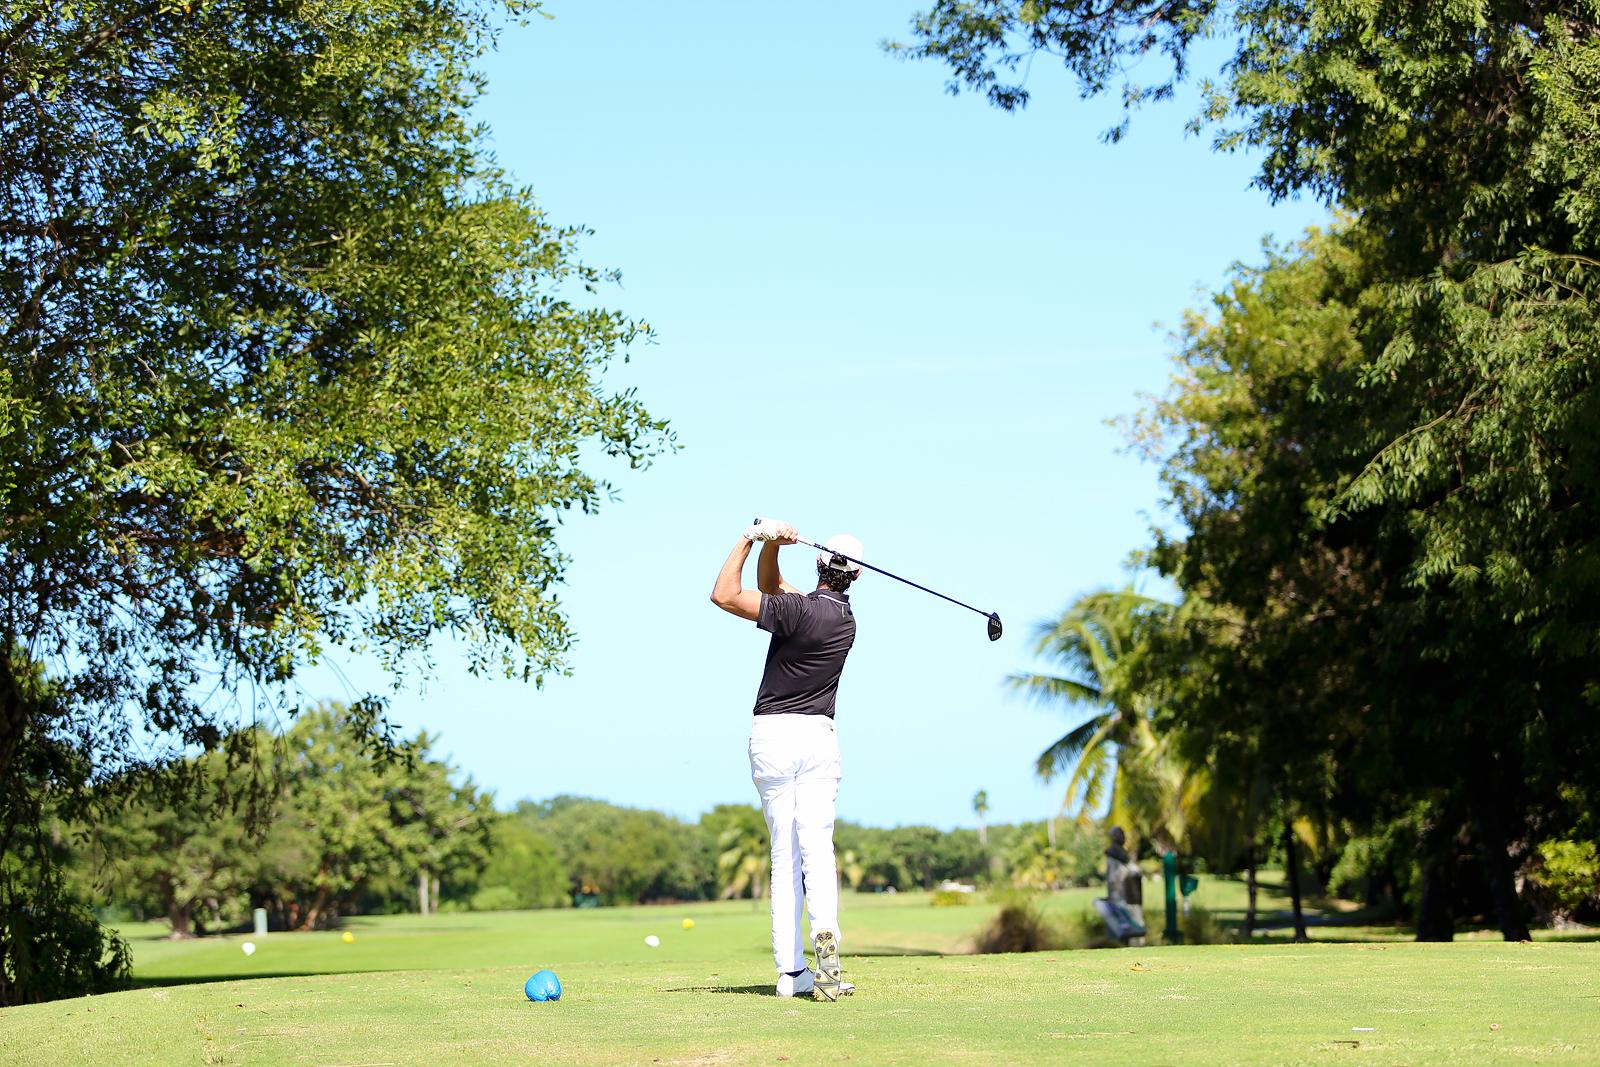 Final golf hole at Key West